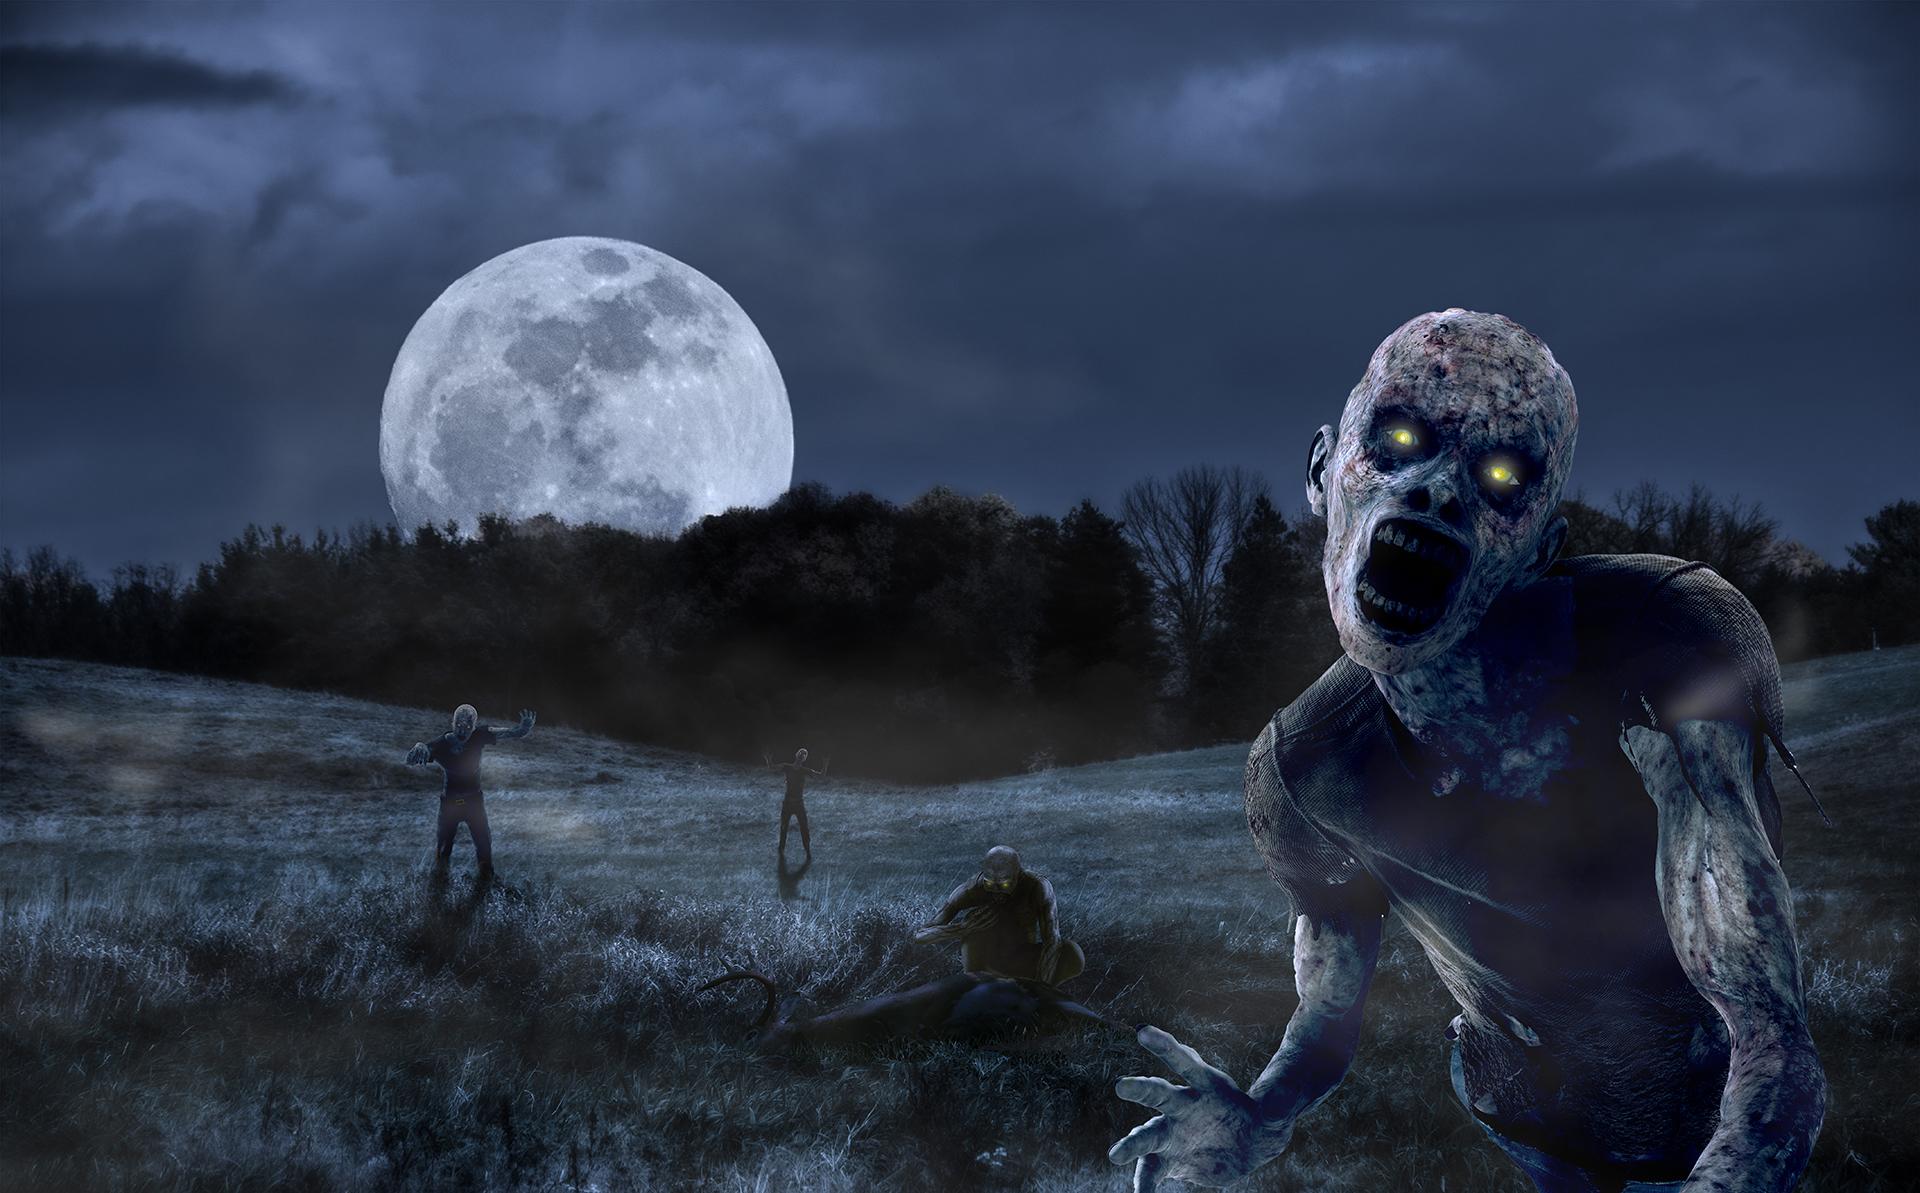 zombies - 2014Photoshop CC